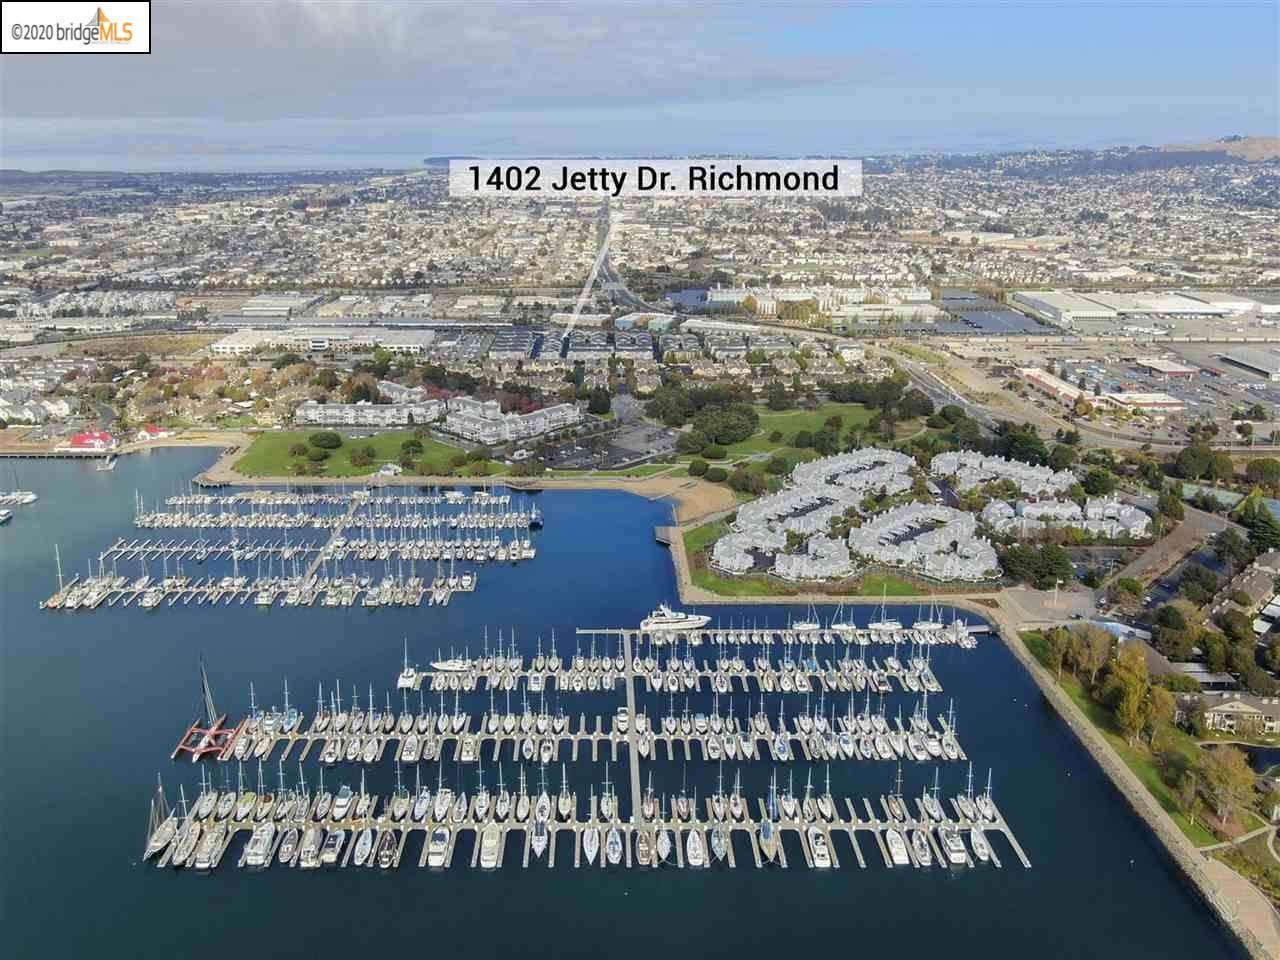 1402 Jetty Dr Richmond, CA 94804